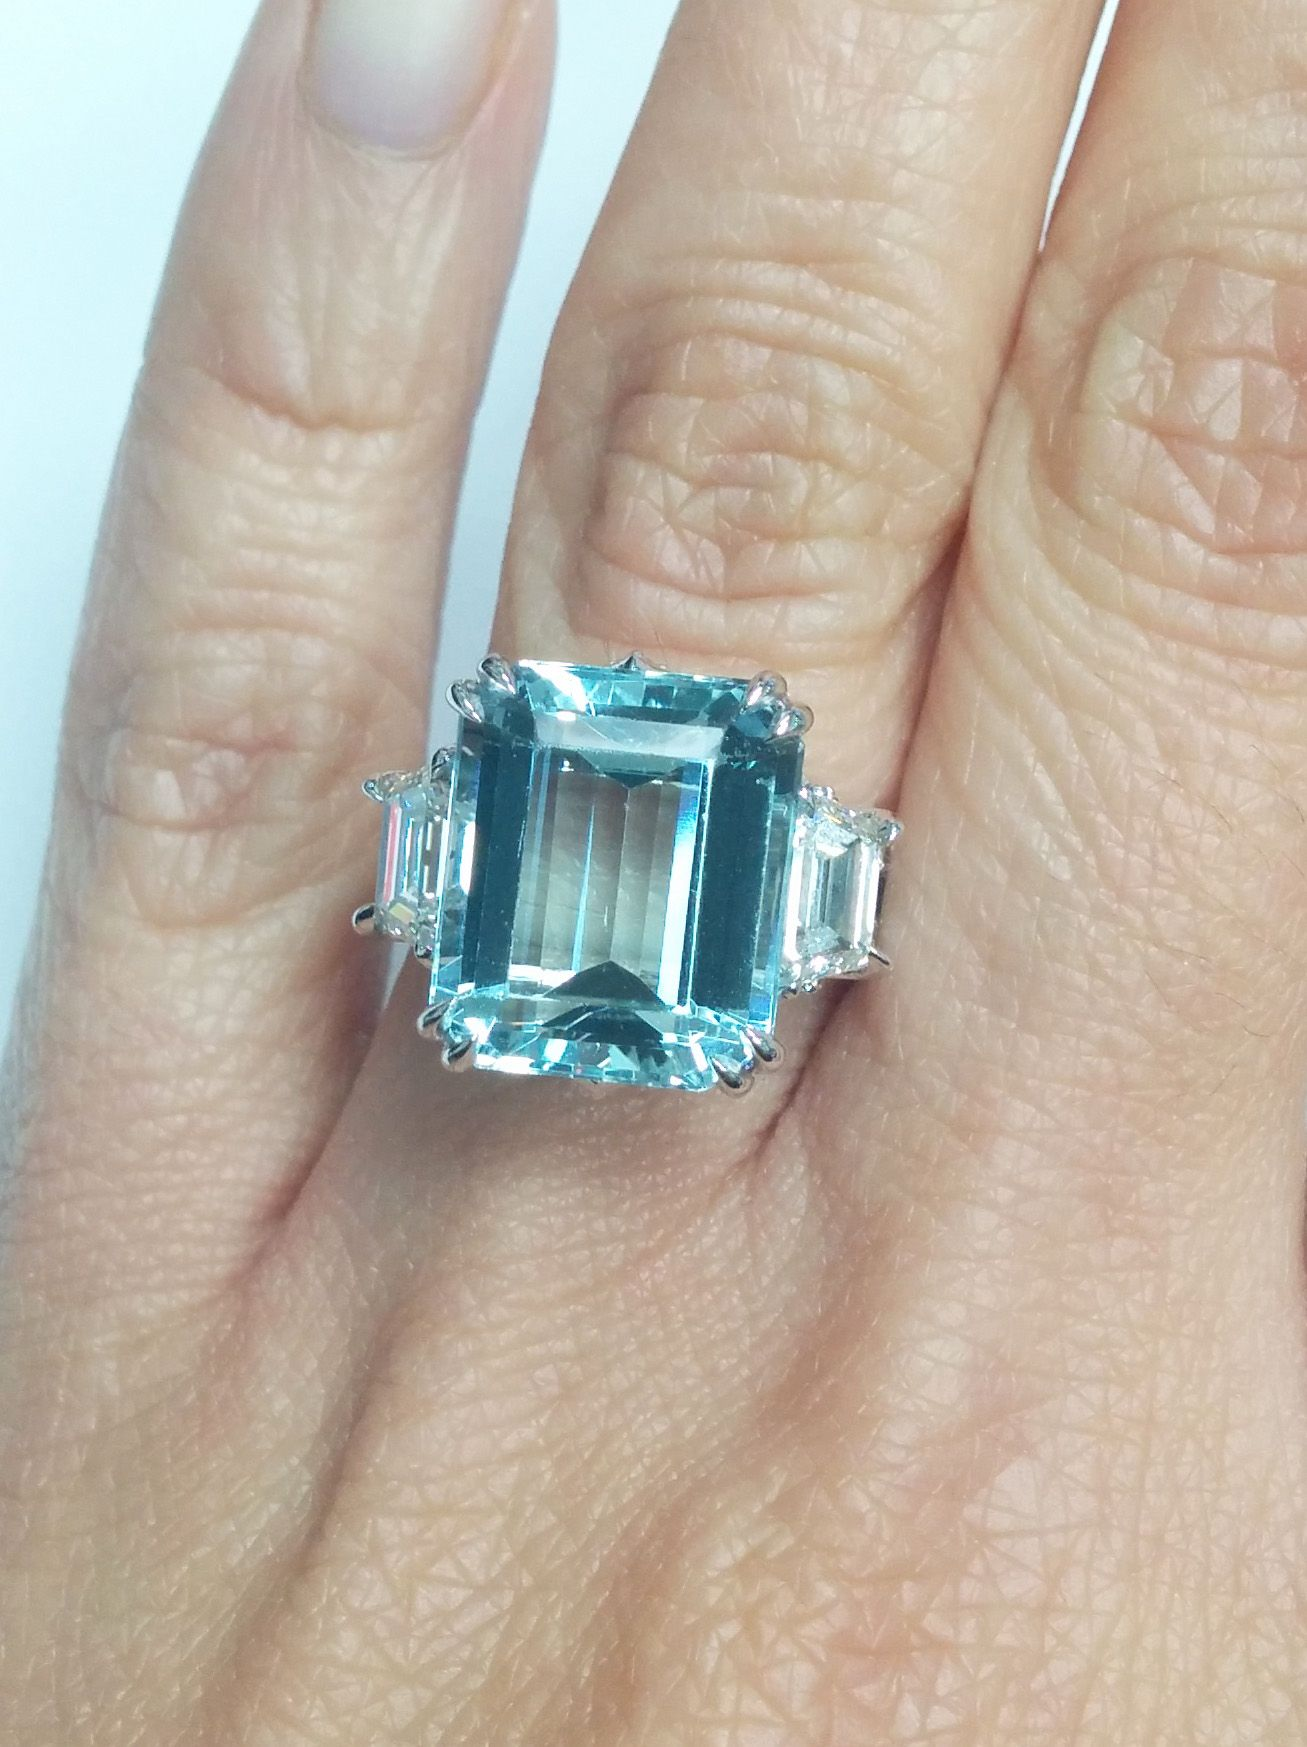 European Engagement Ring 730 CTW Large Emerald Cut